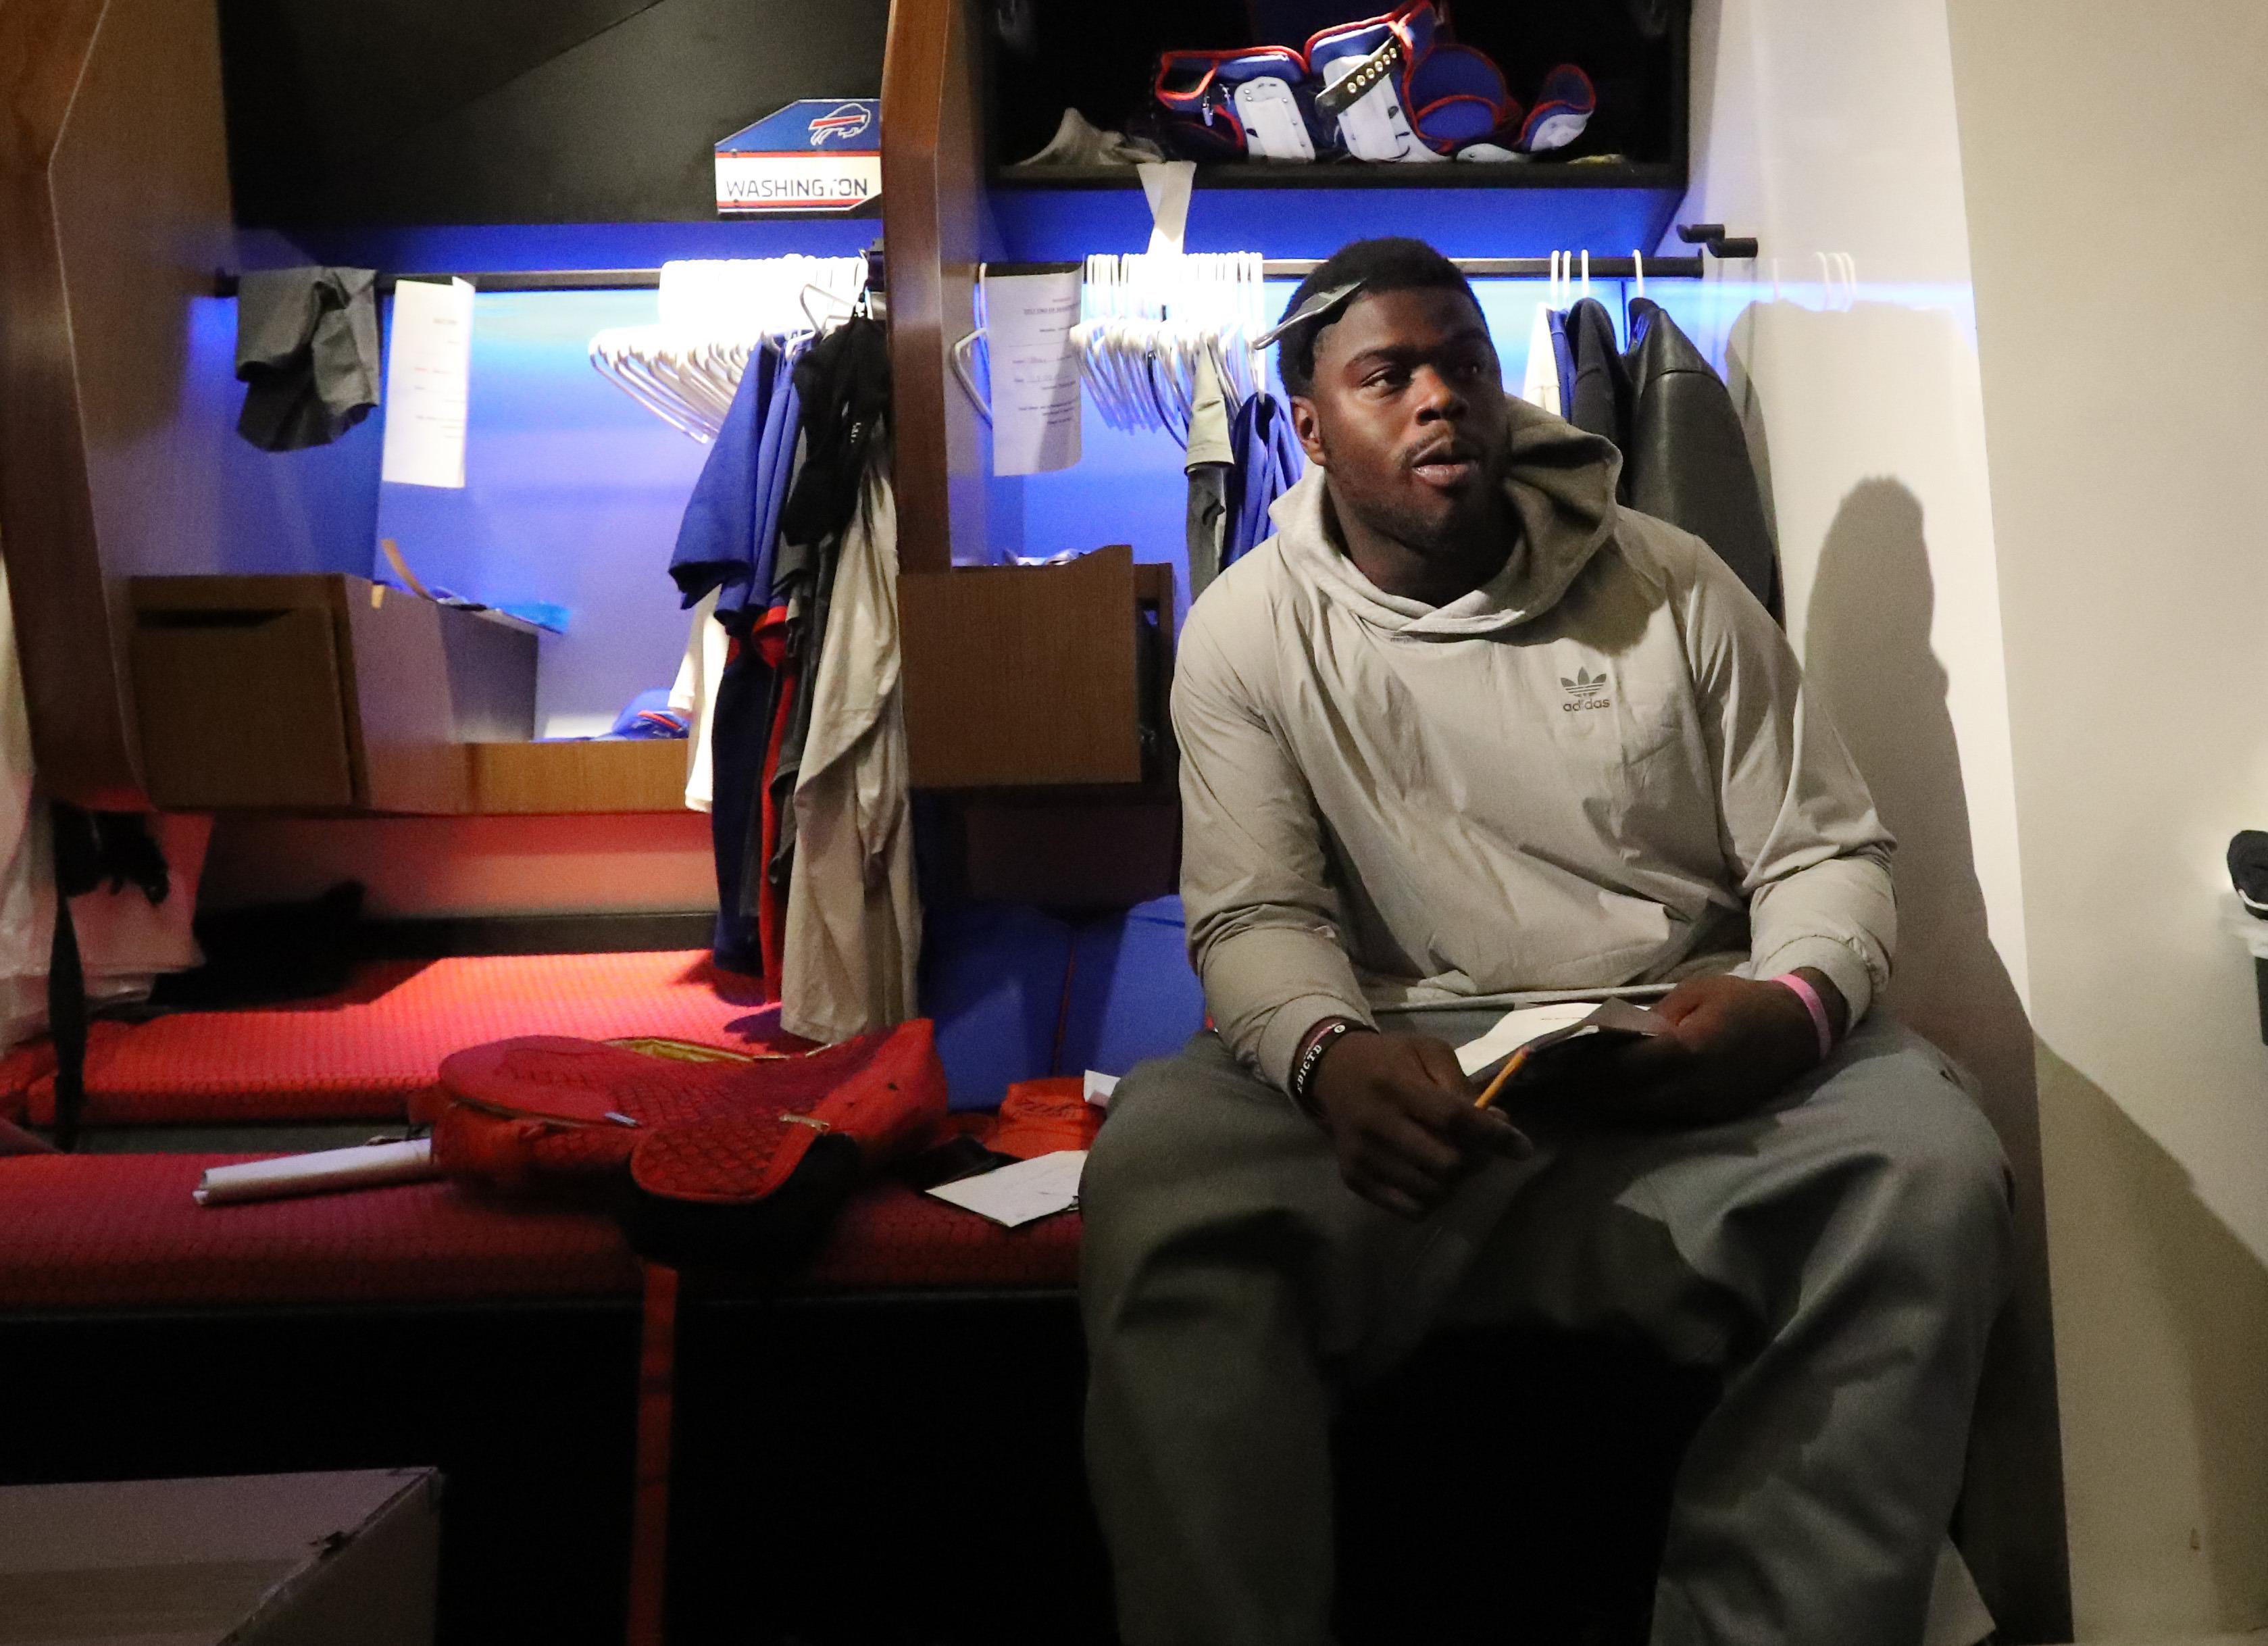 Shaq Lawson underwent arthroscopic knee surgery following the 2016 season. (James P. McCoy/Buffalo News)